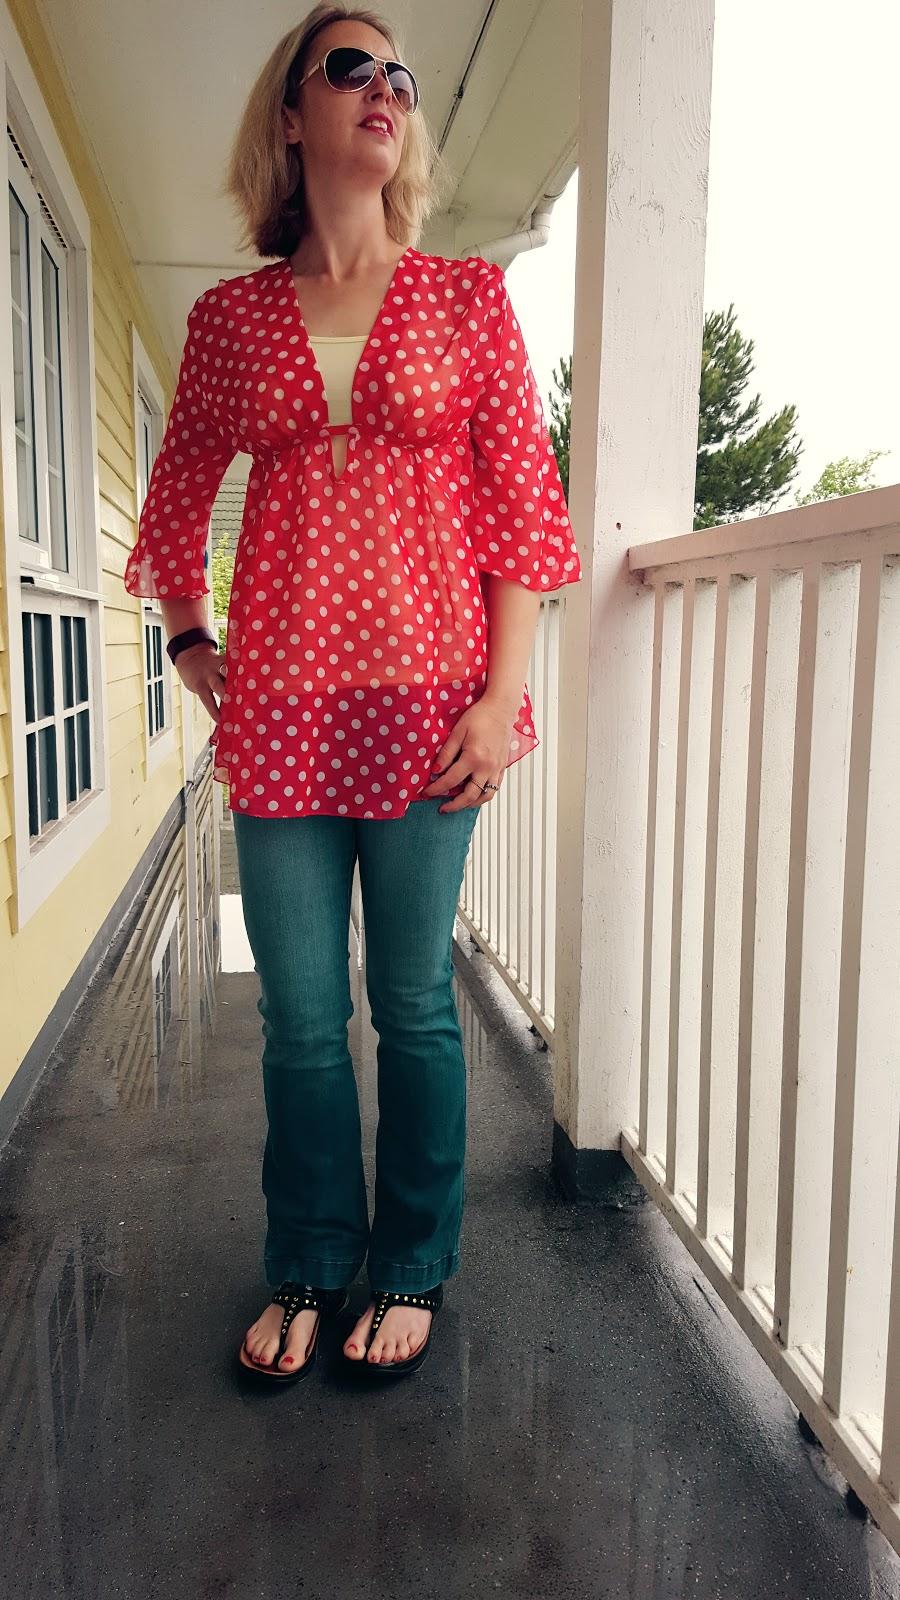 Polka Dots, Rain, Sunglasses